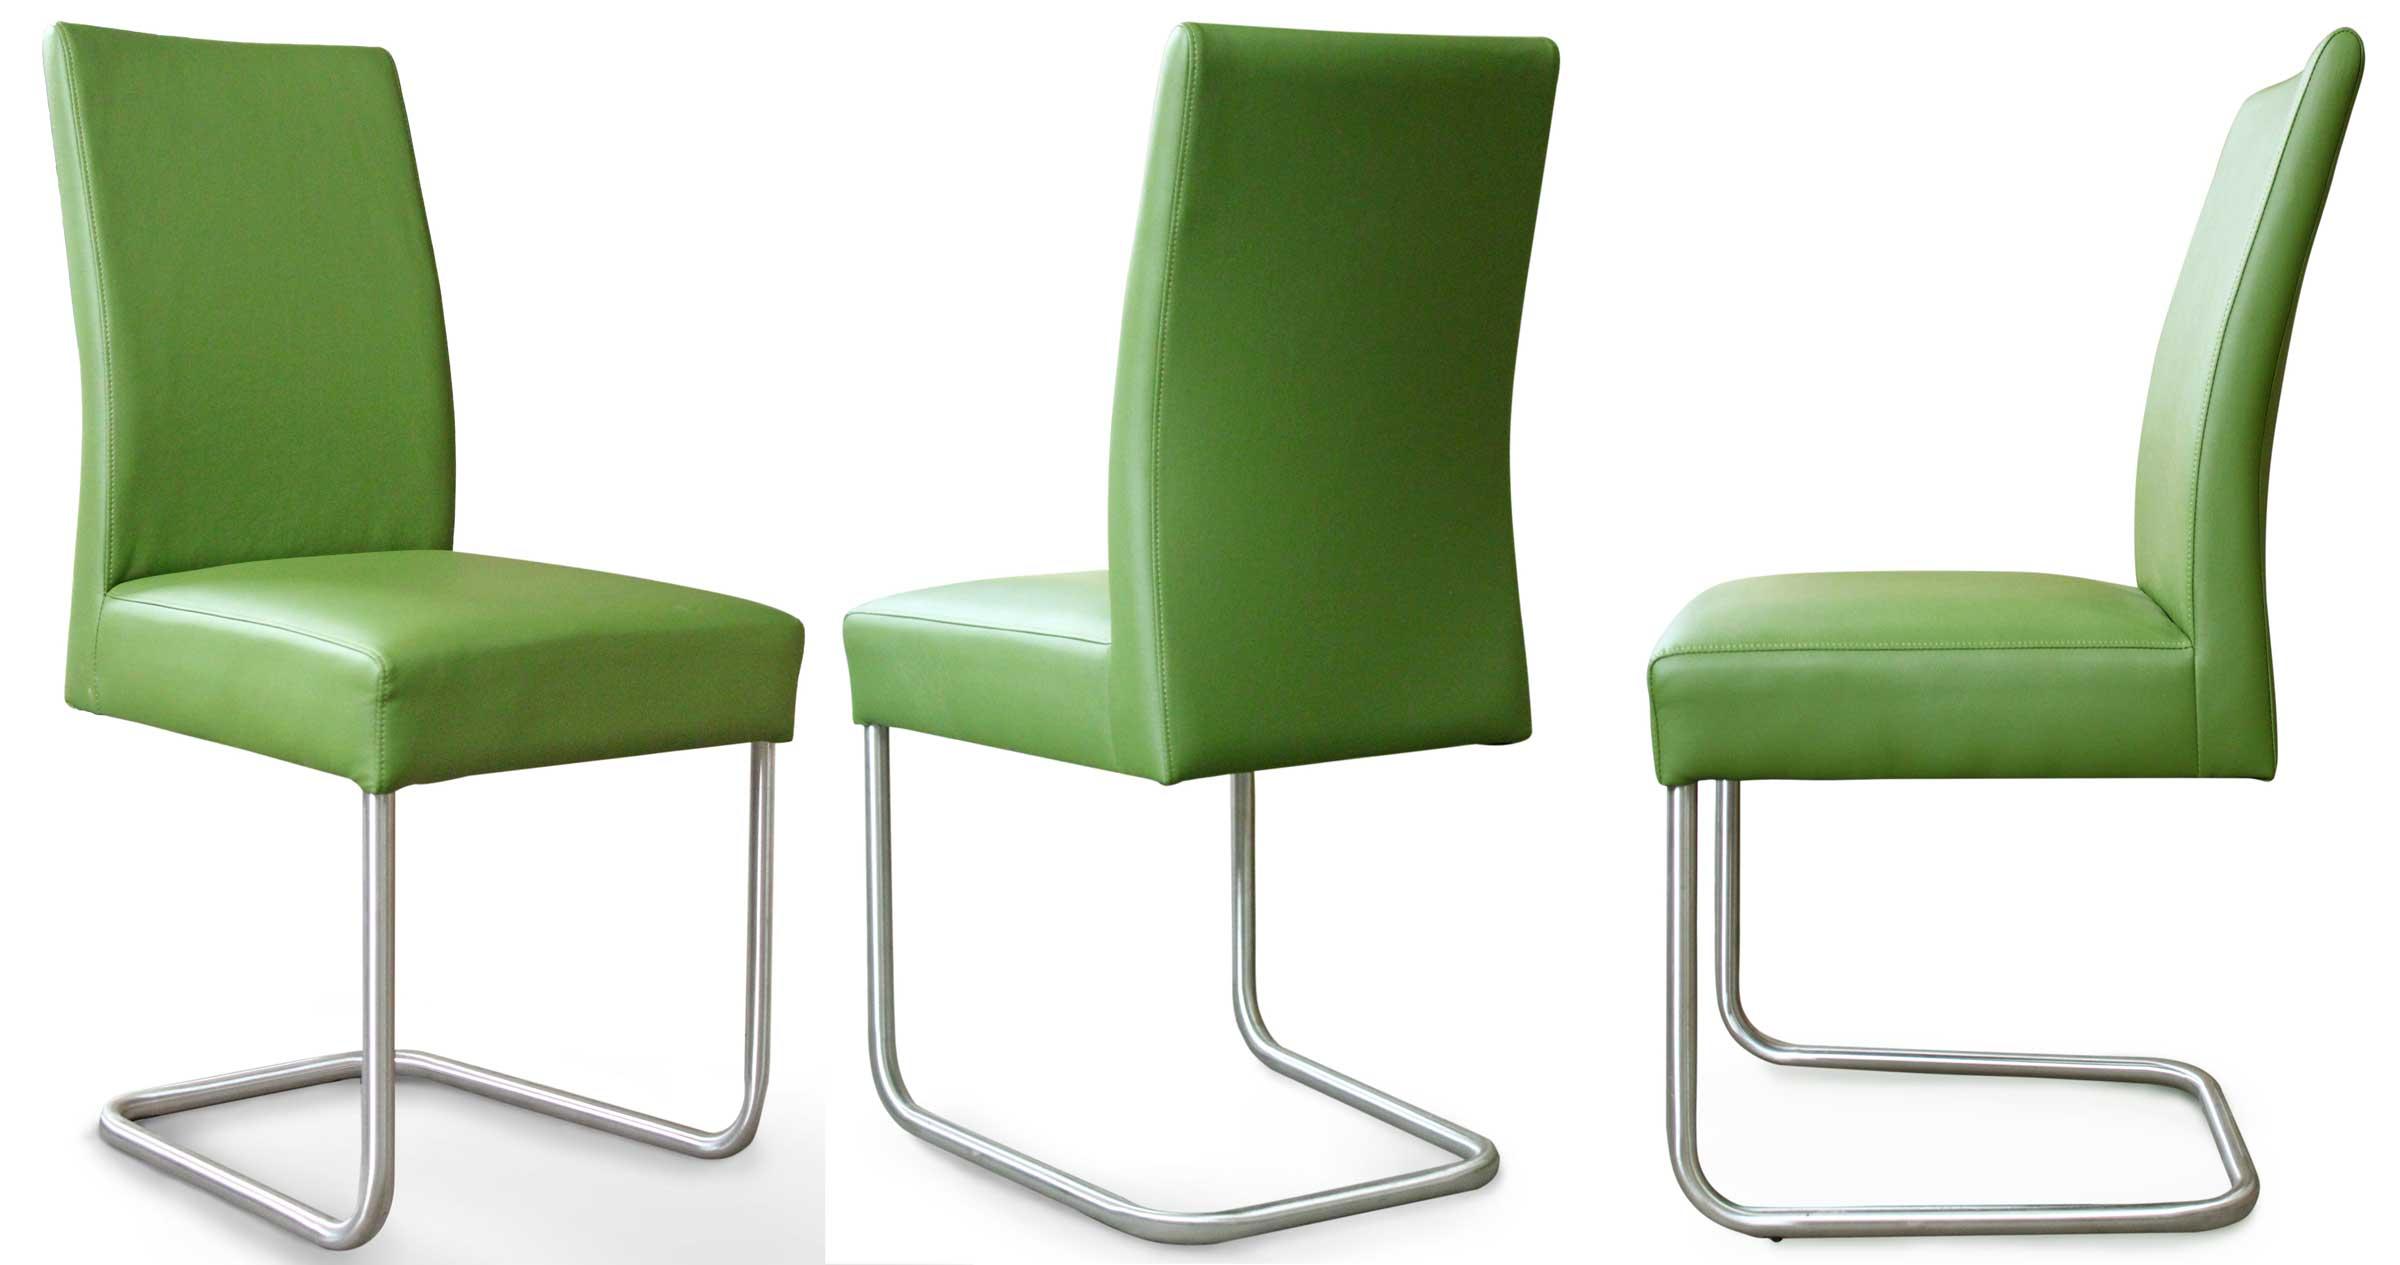 Schwingstuhl Kunstleder grün